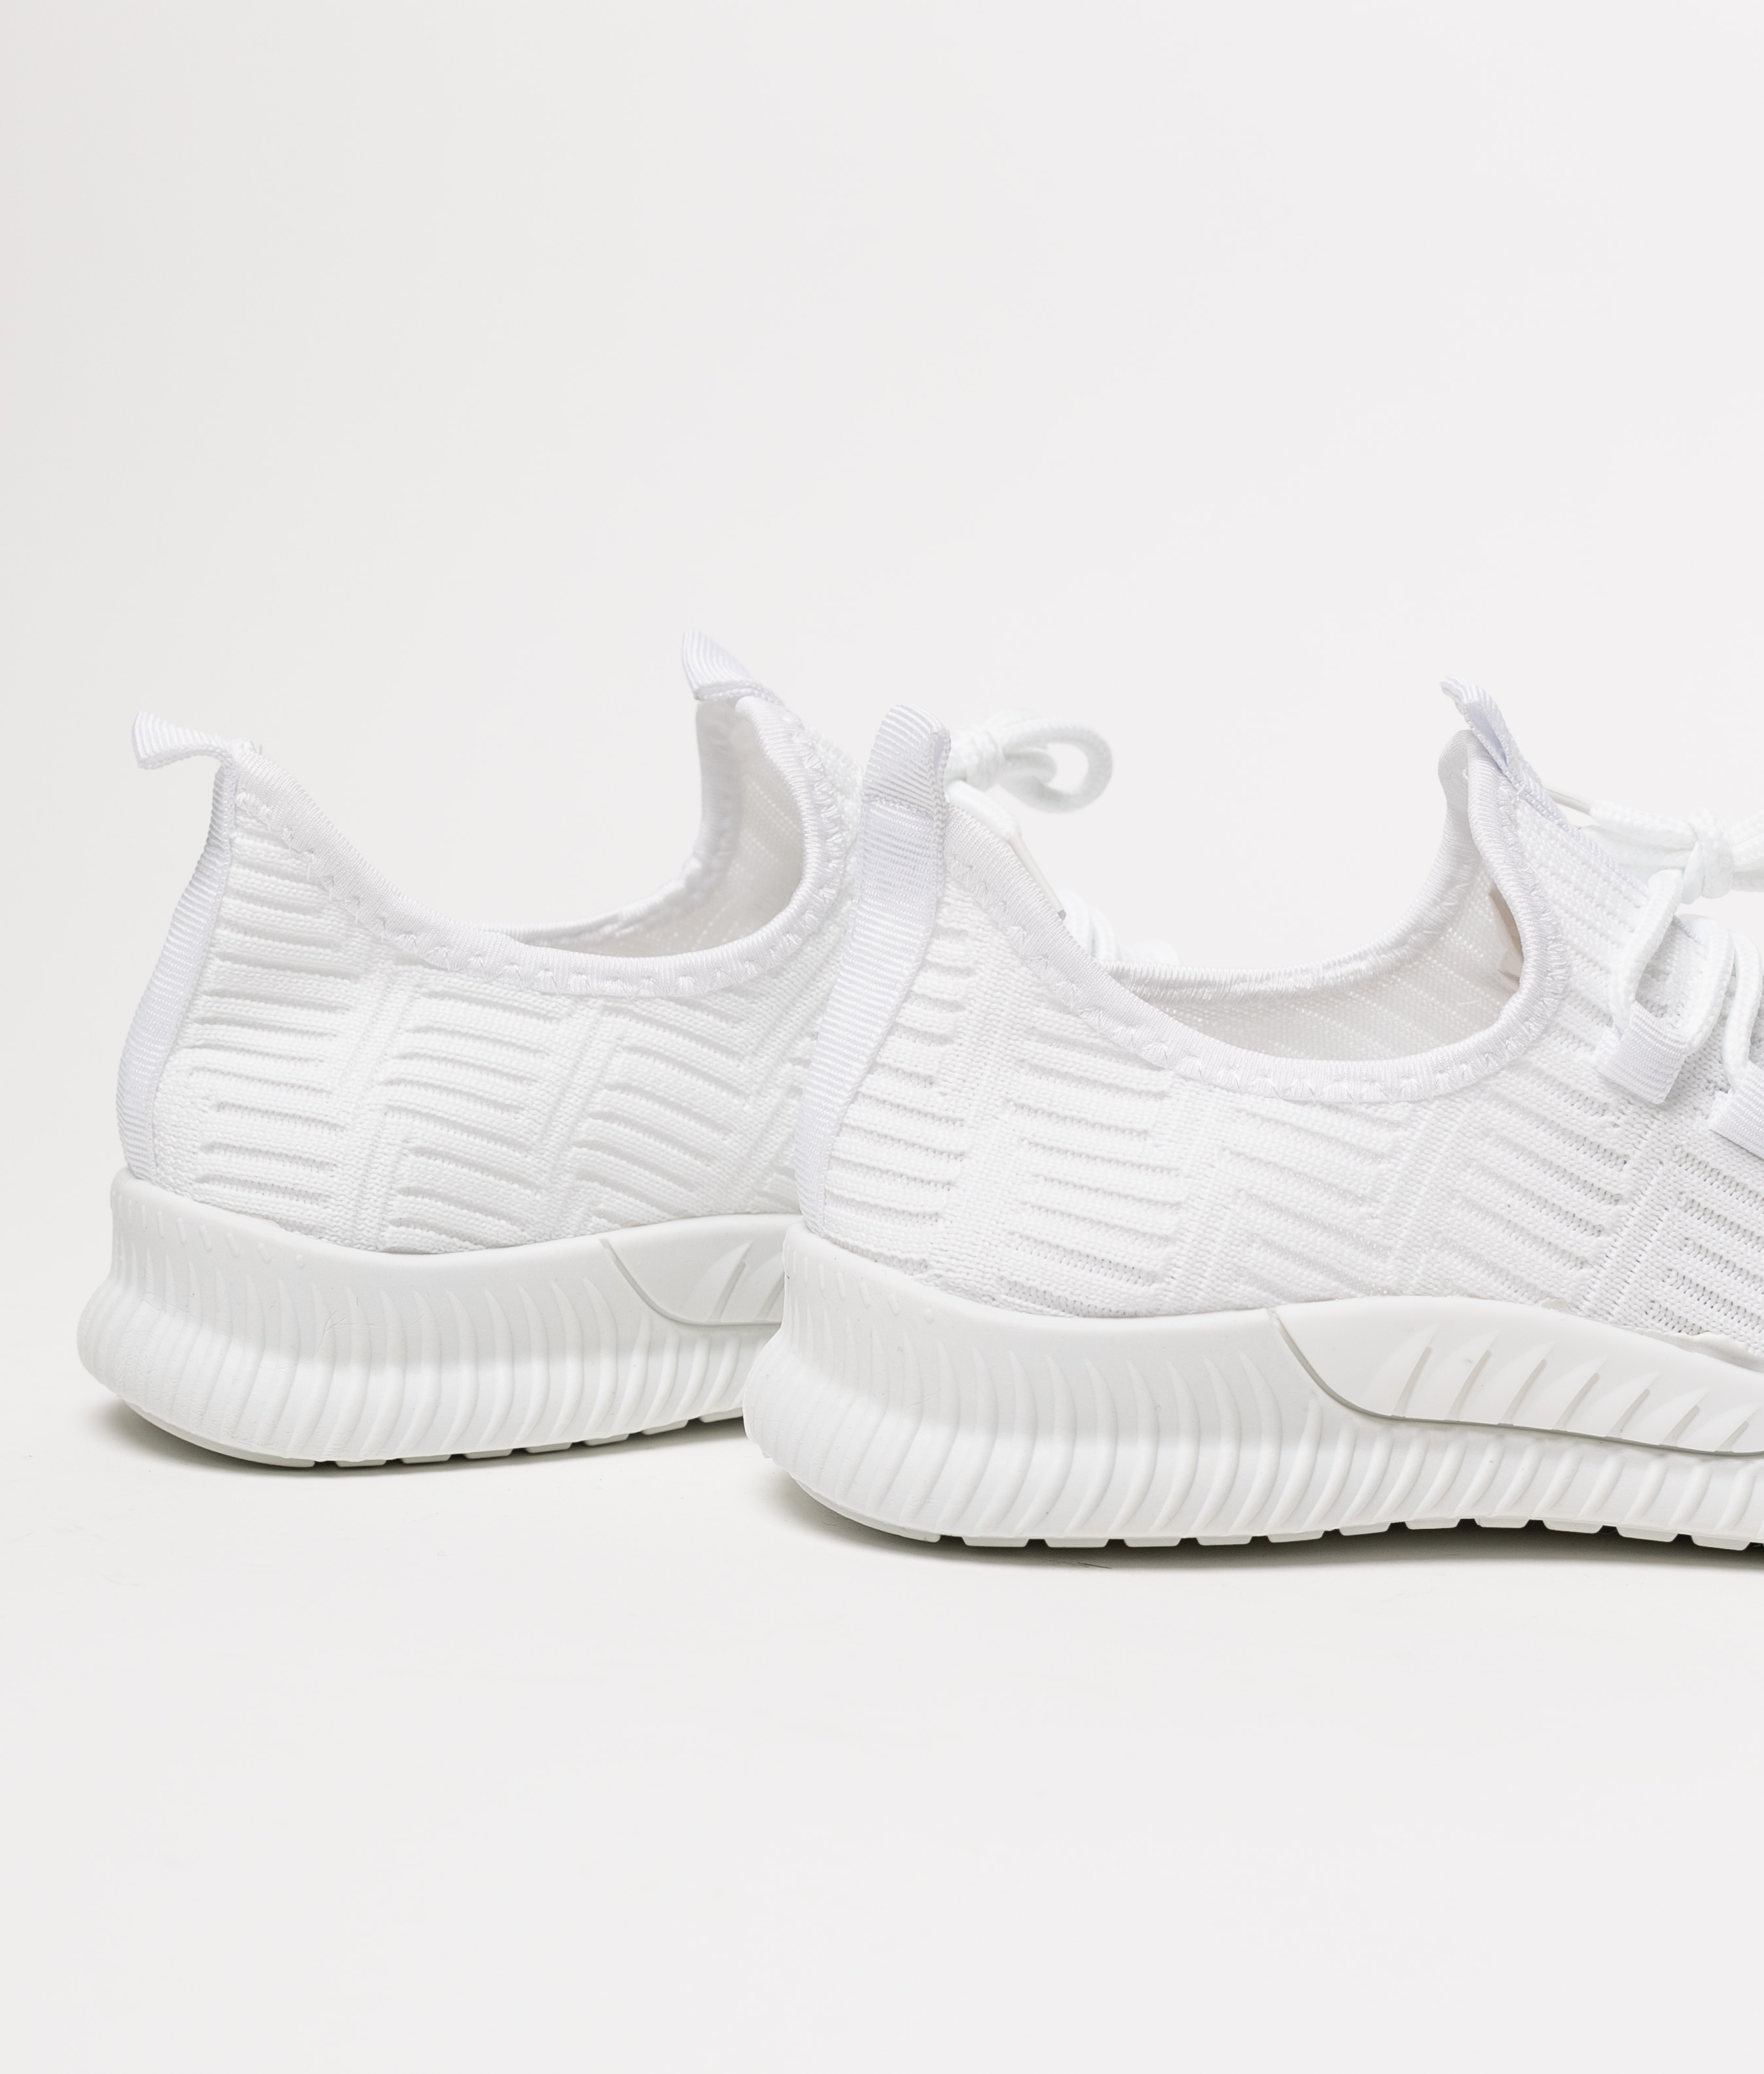 Sneakers Kupir - White